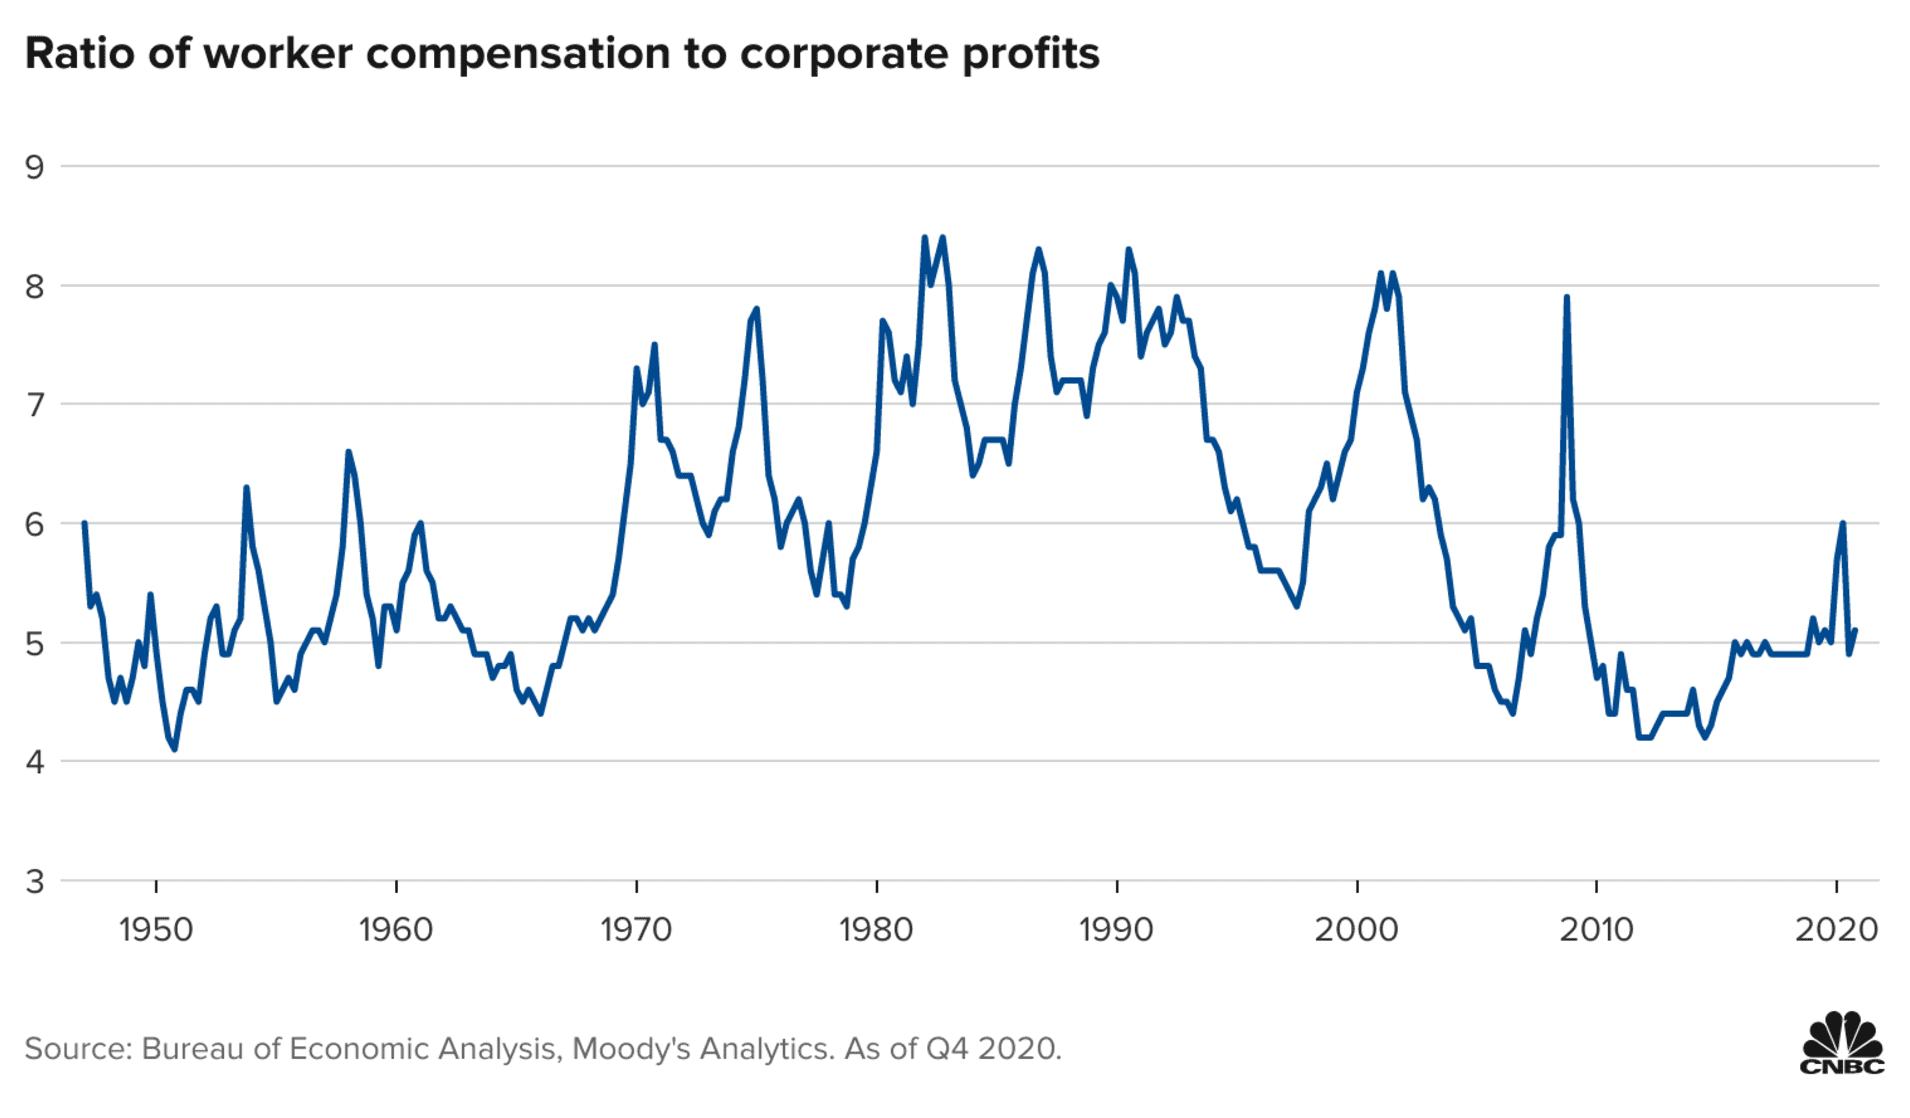 106885200-1621436151535-20210519-EFunA-ratio-of-worker-compensation-to-corporate-profits_v2